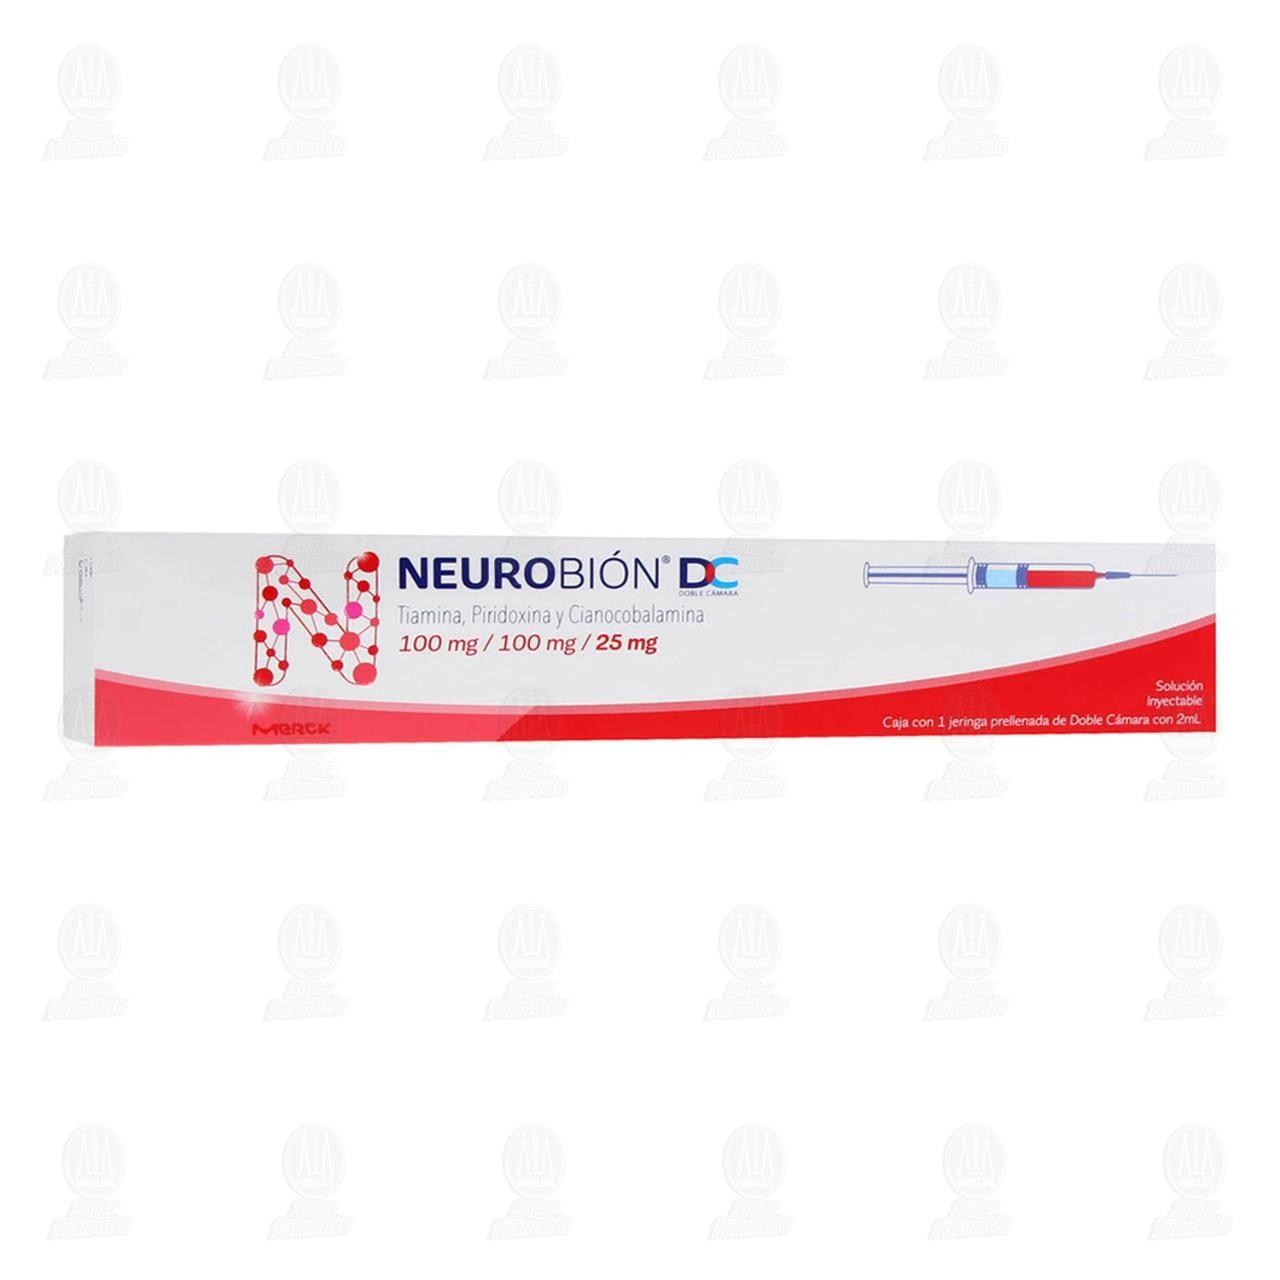 Comprar Neurobión 100mg/100mg/25mg con 1 Jeringa Doble Cámara en Farmacias Guadalajara